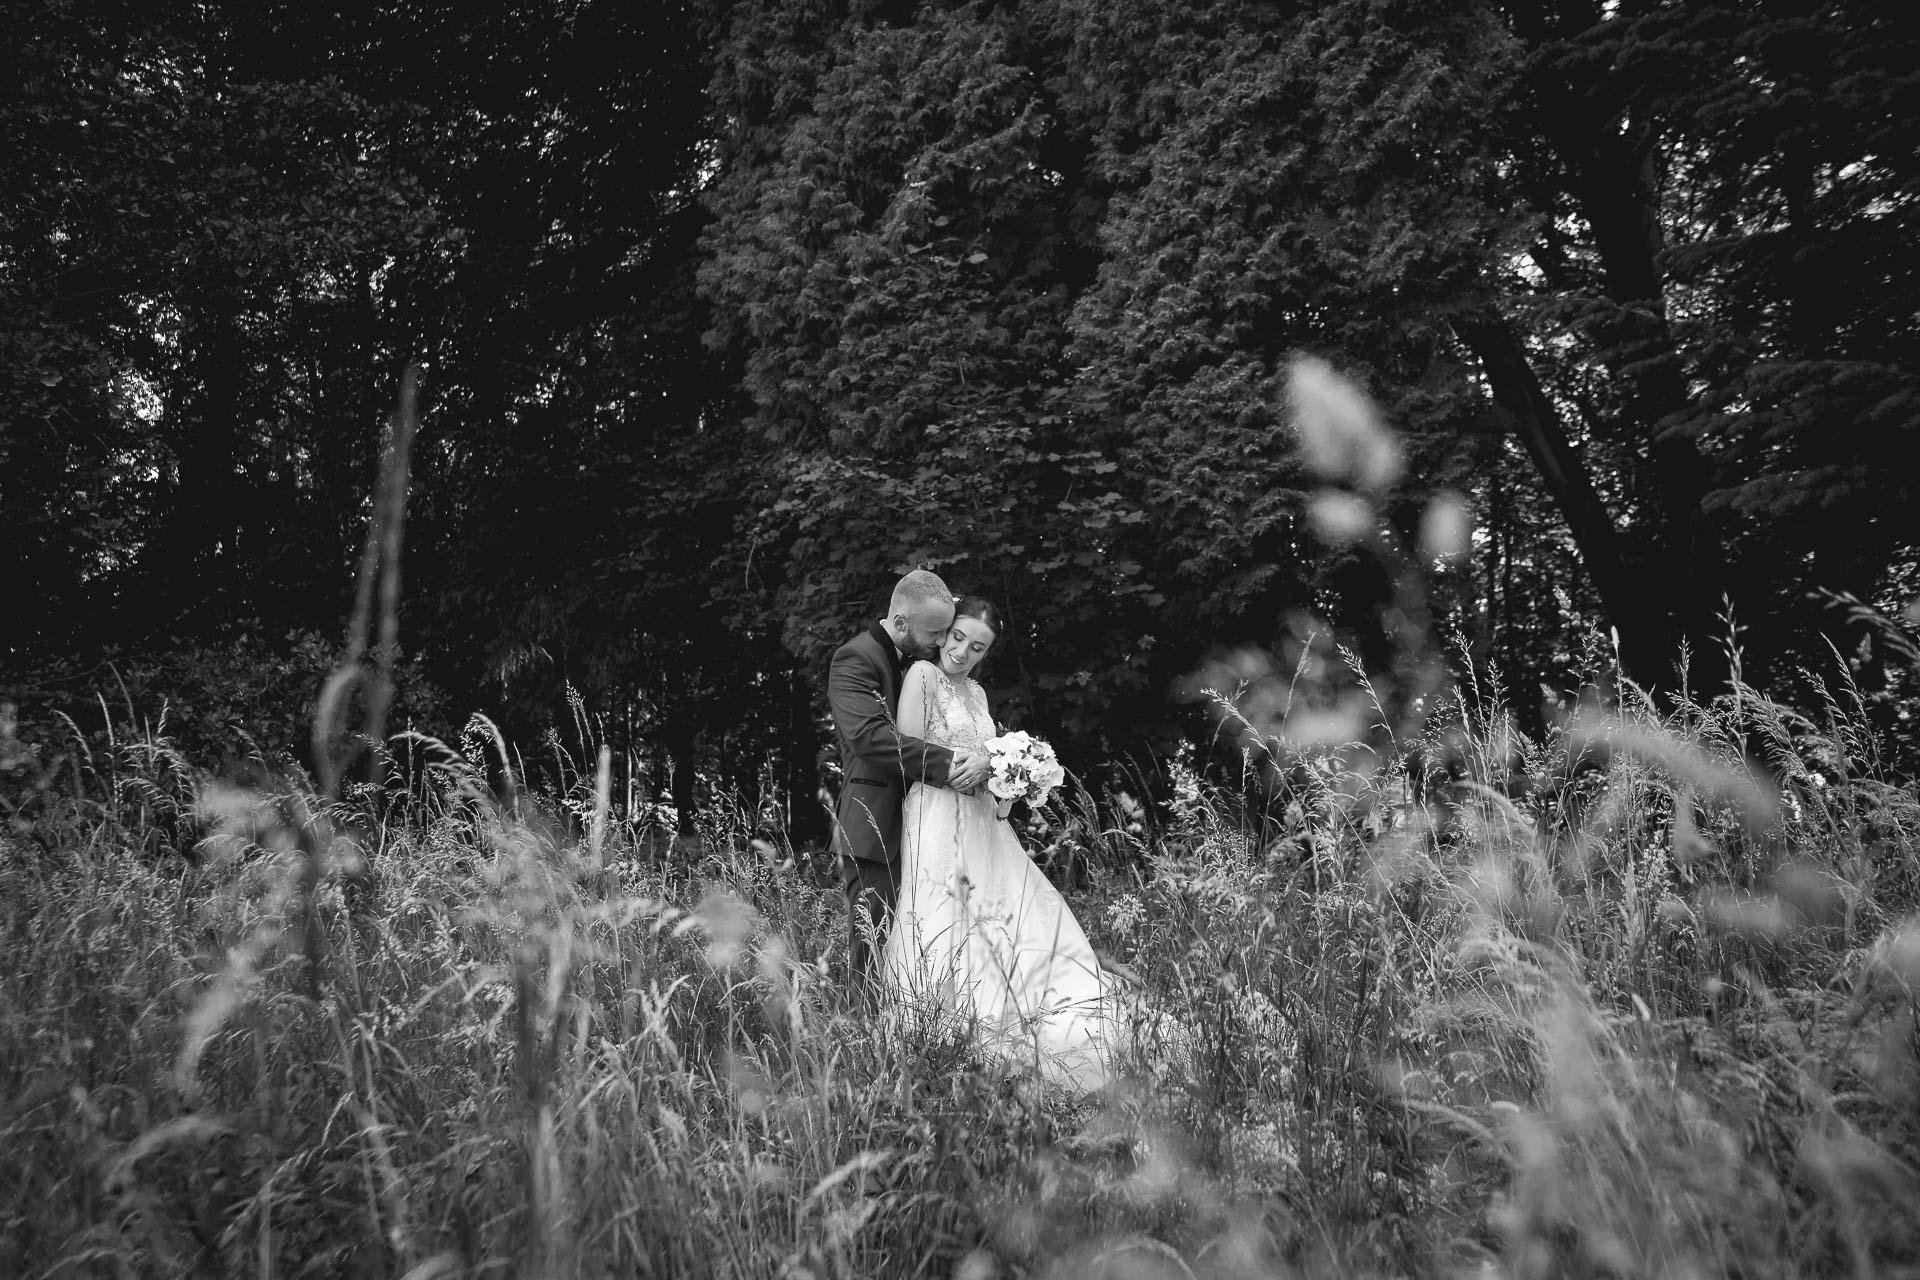 svatební-fotograf-svatebni-video-Nymburk-hotel-Ostrov-Beautyfoto-6305